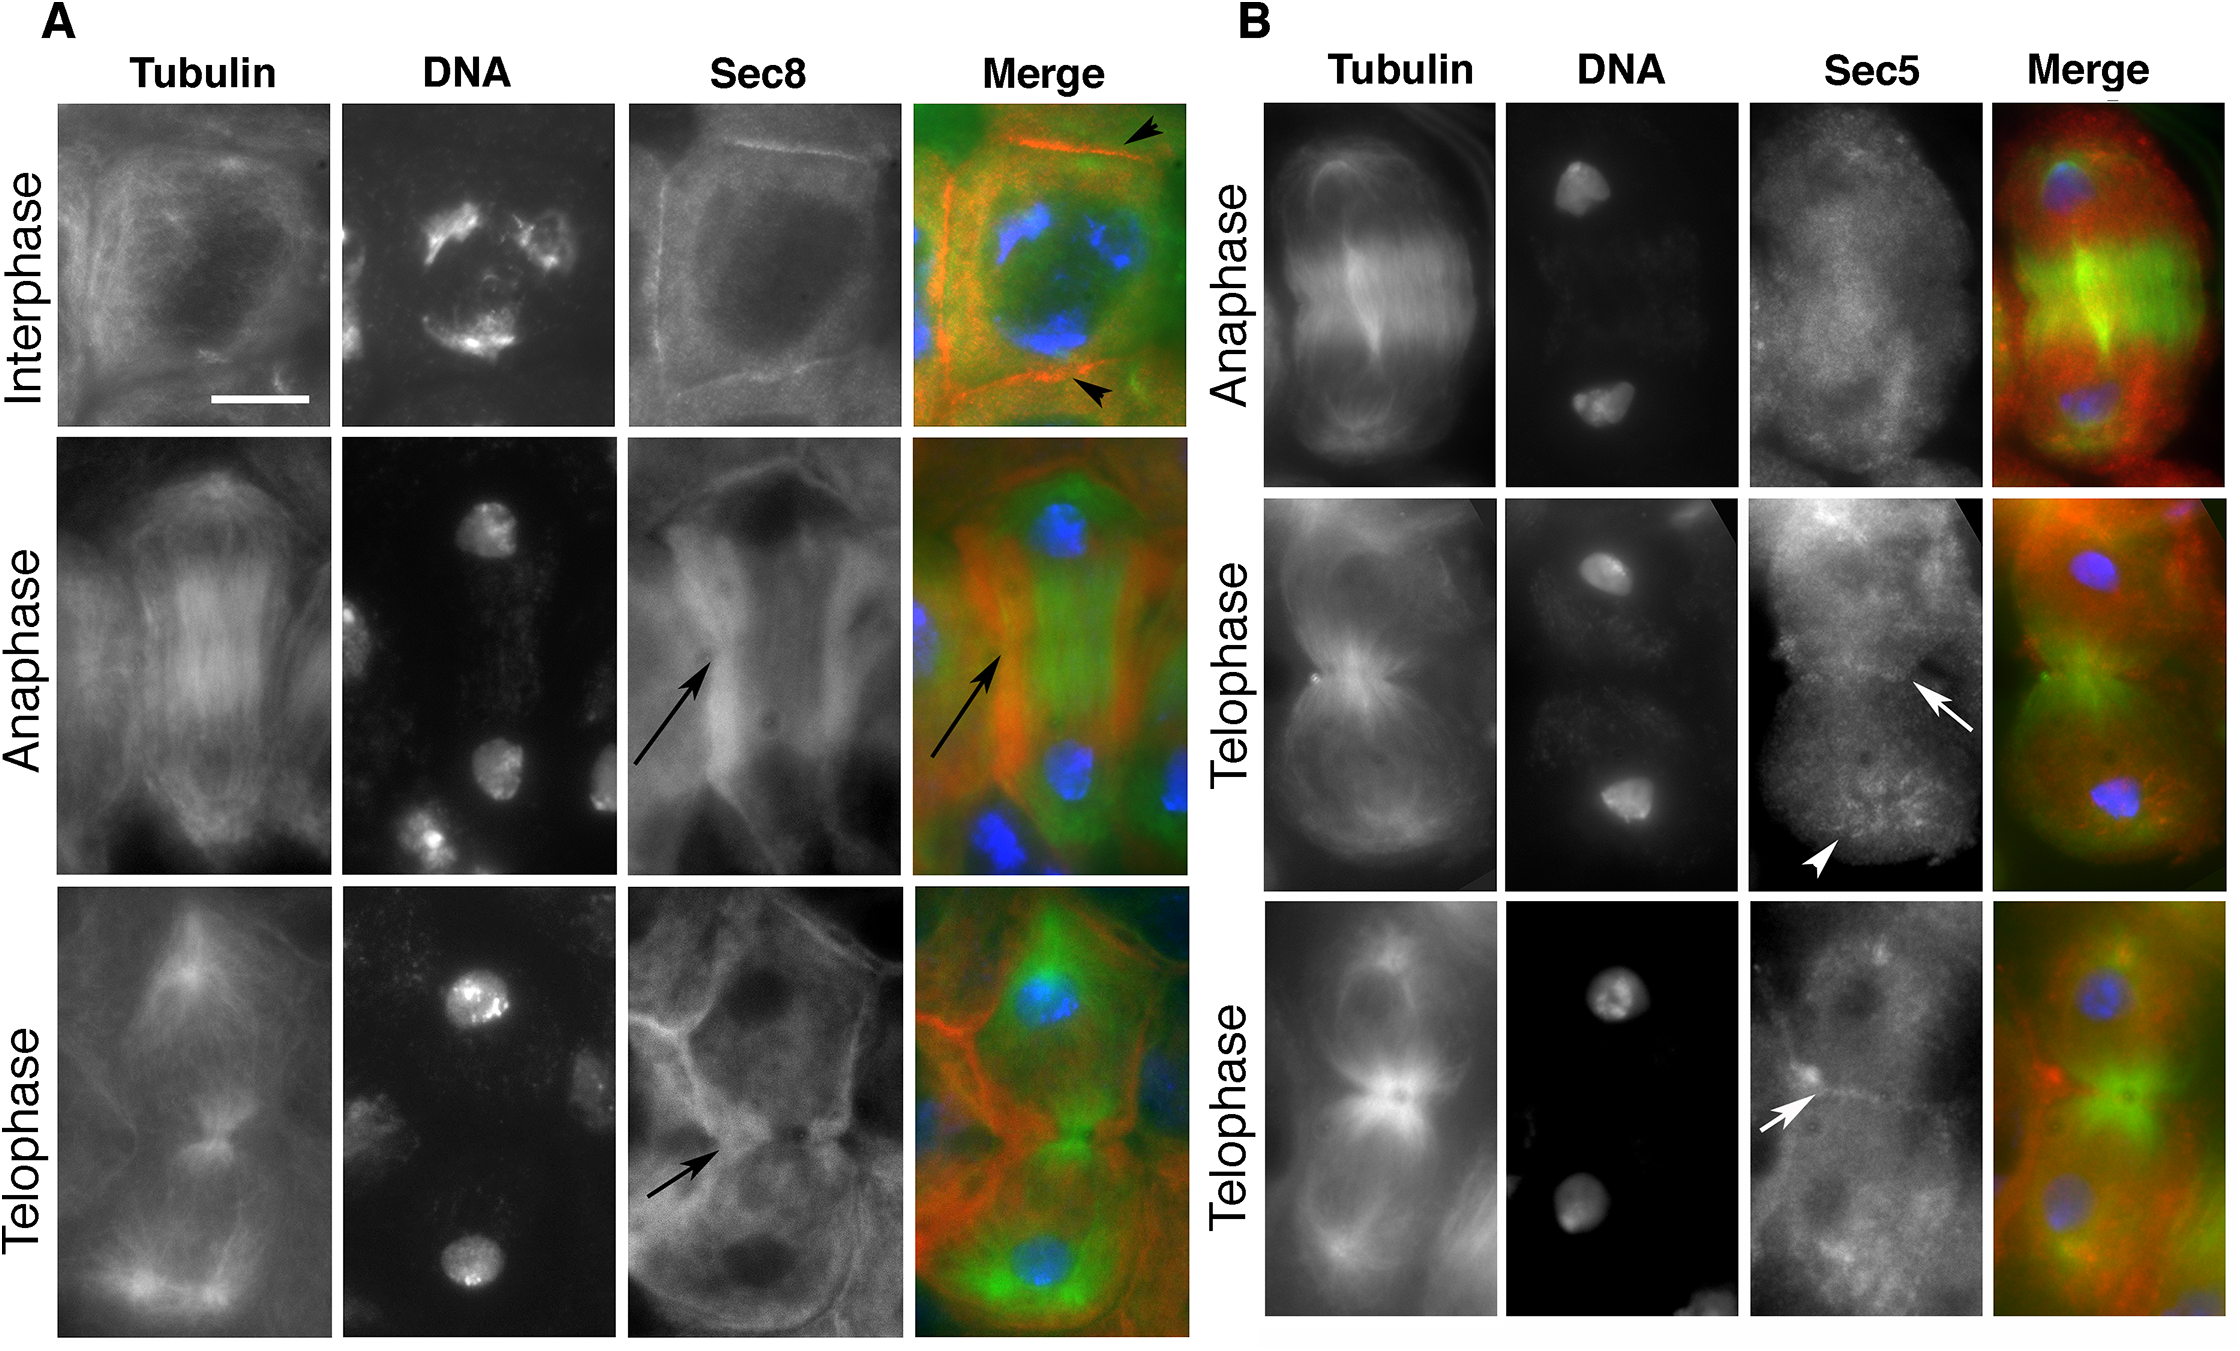 Localization of exocyst complex proteins in dividing spermatocytes.